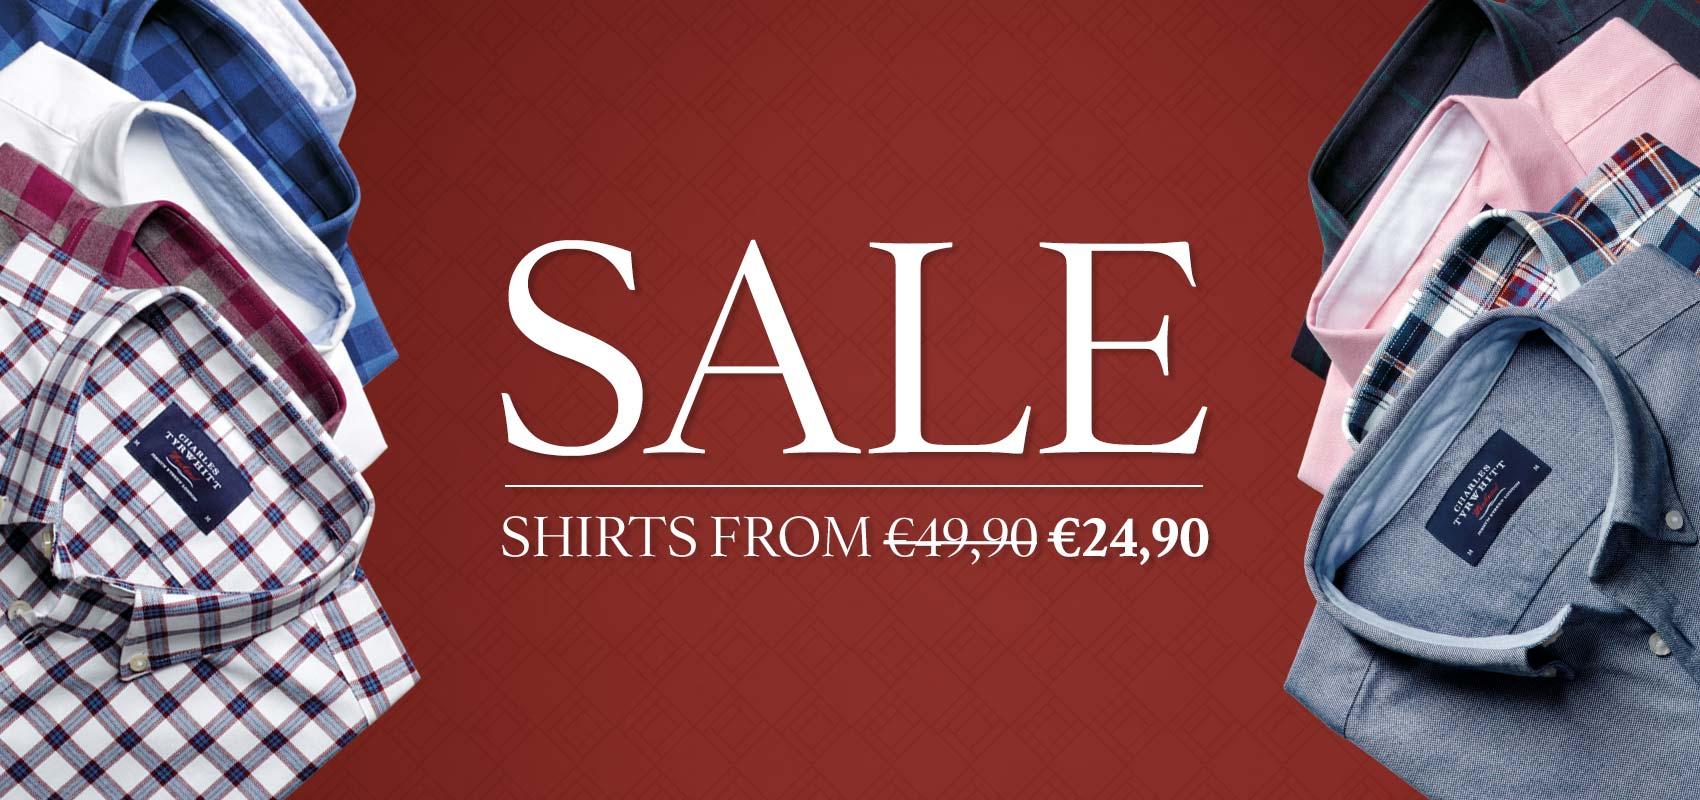 Charles Tyrwhitt Casual Shirt Sale